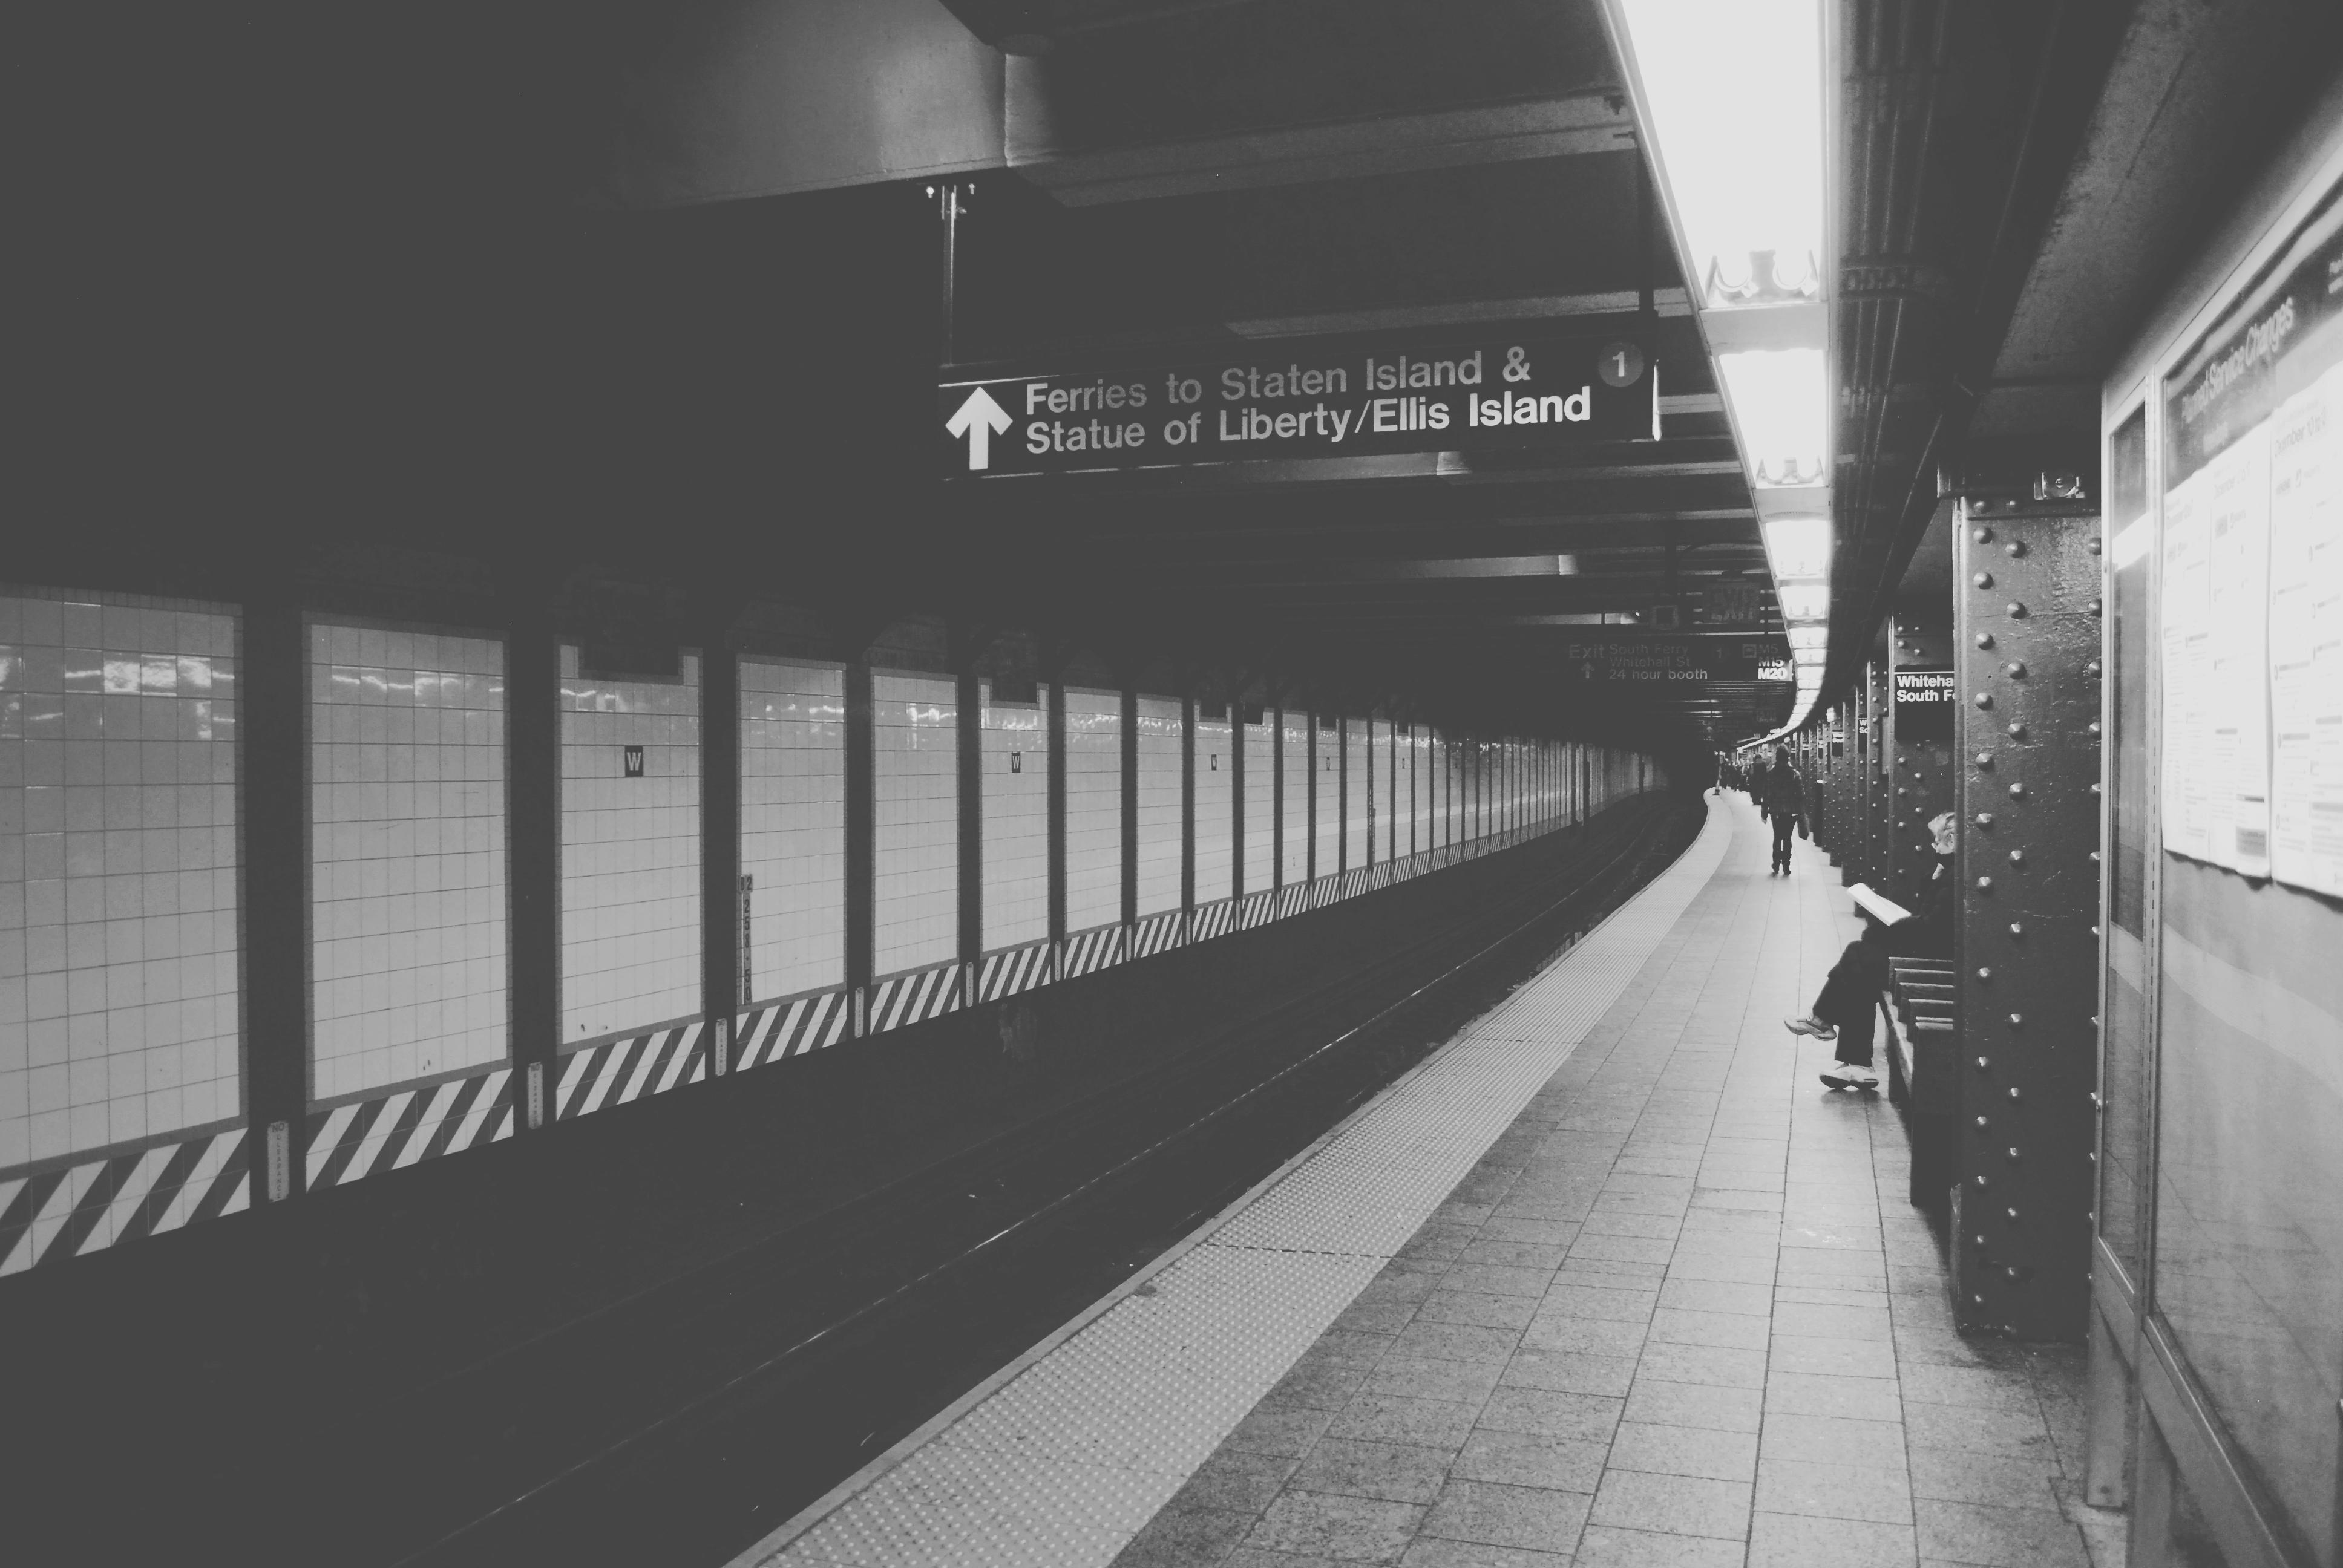 Train Station, Train, Subway, People, Light, HQ Photo